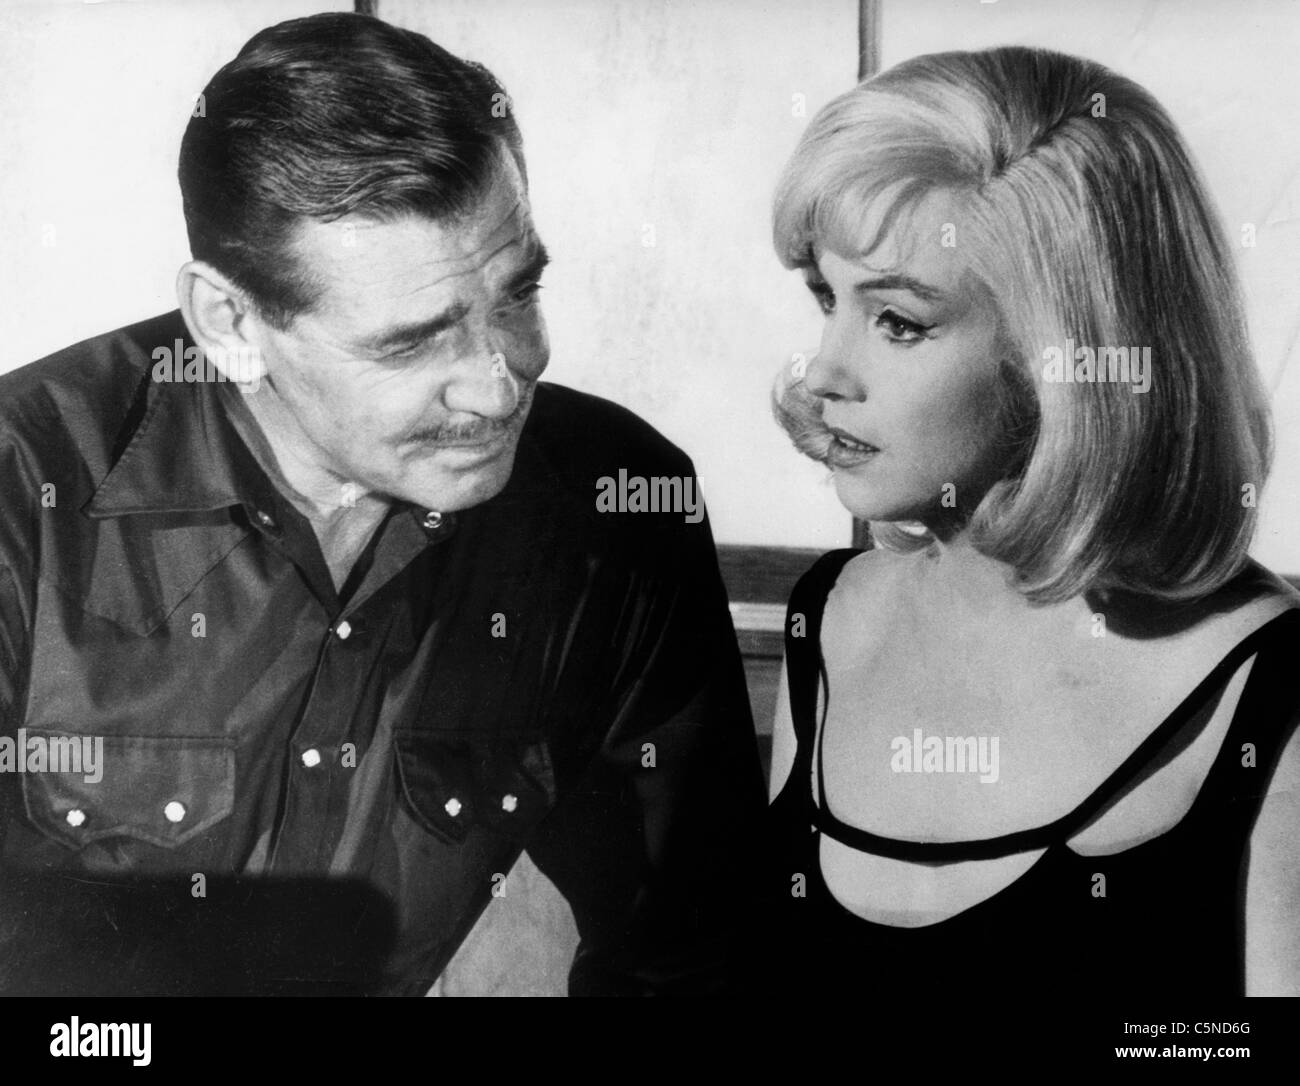 the misfits, clarke gable, marilyn monroe, 1961' - Stock Image